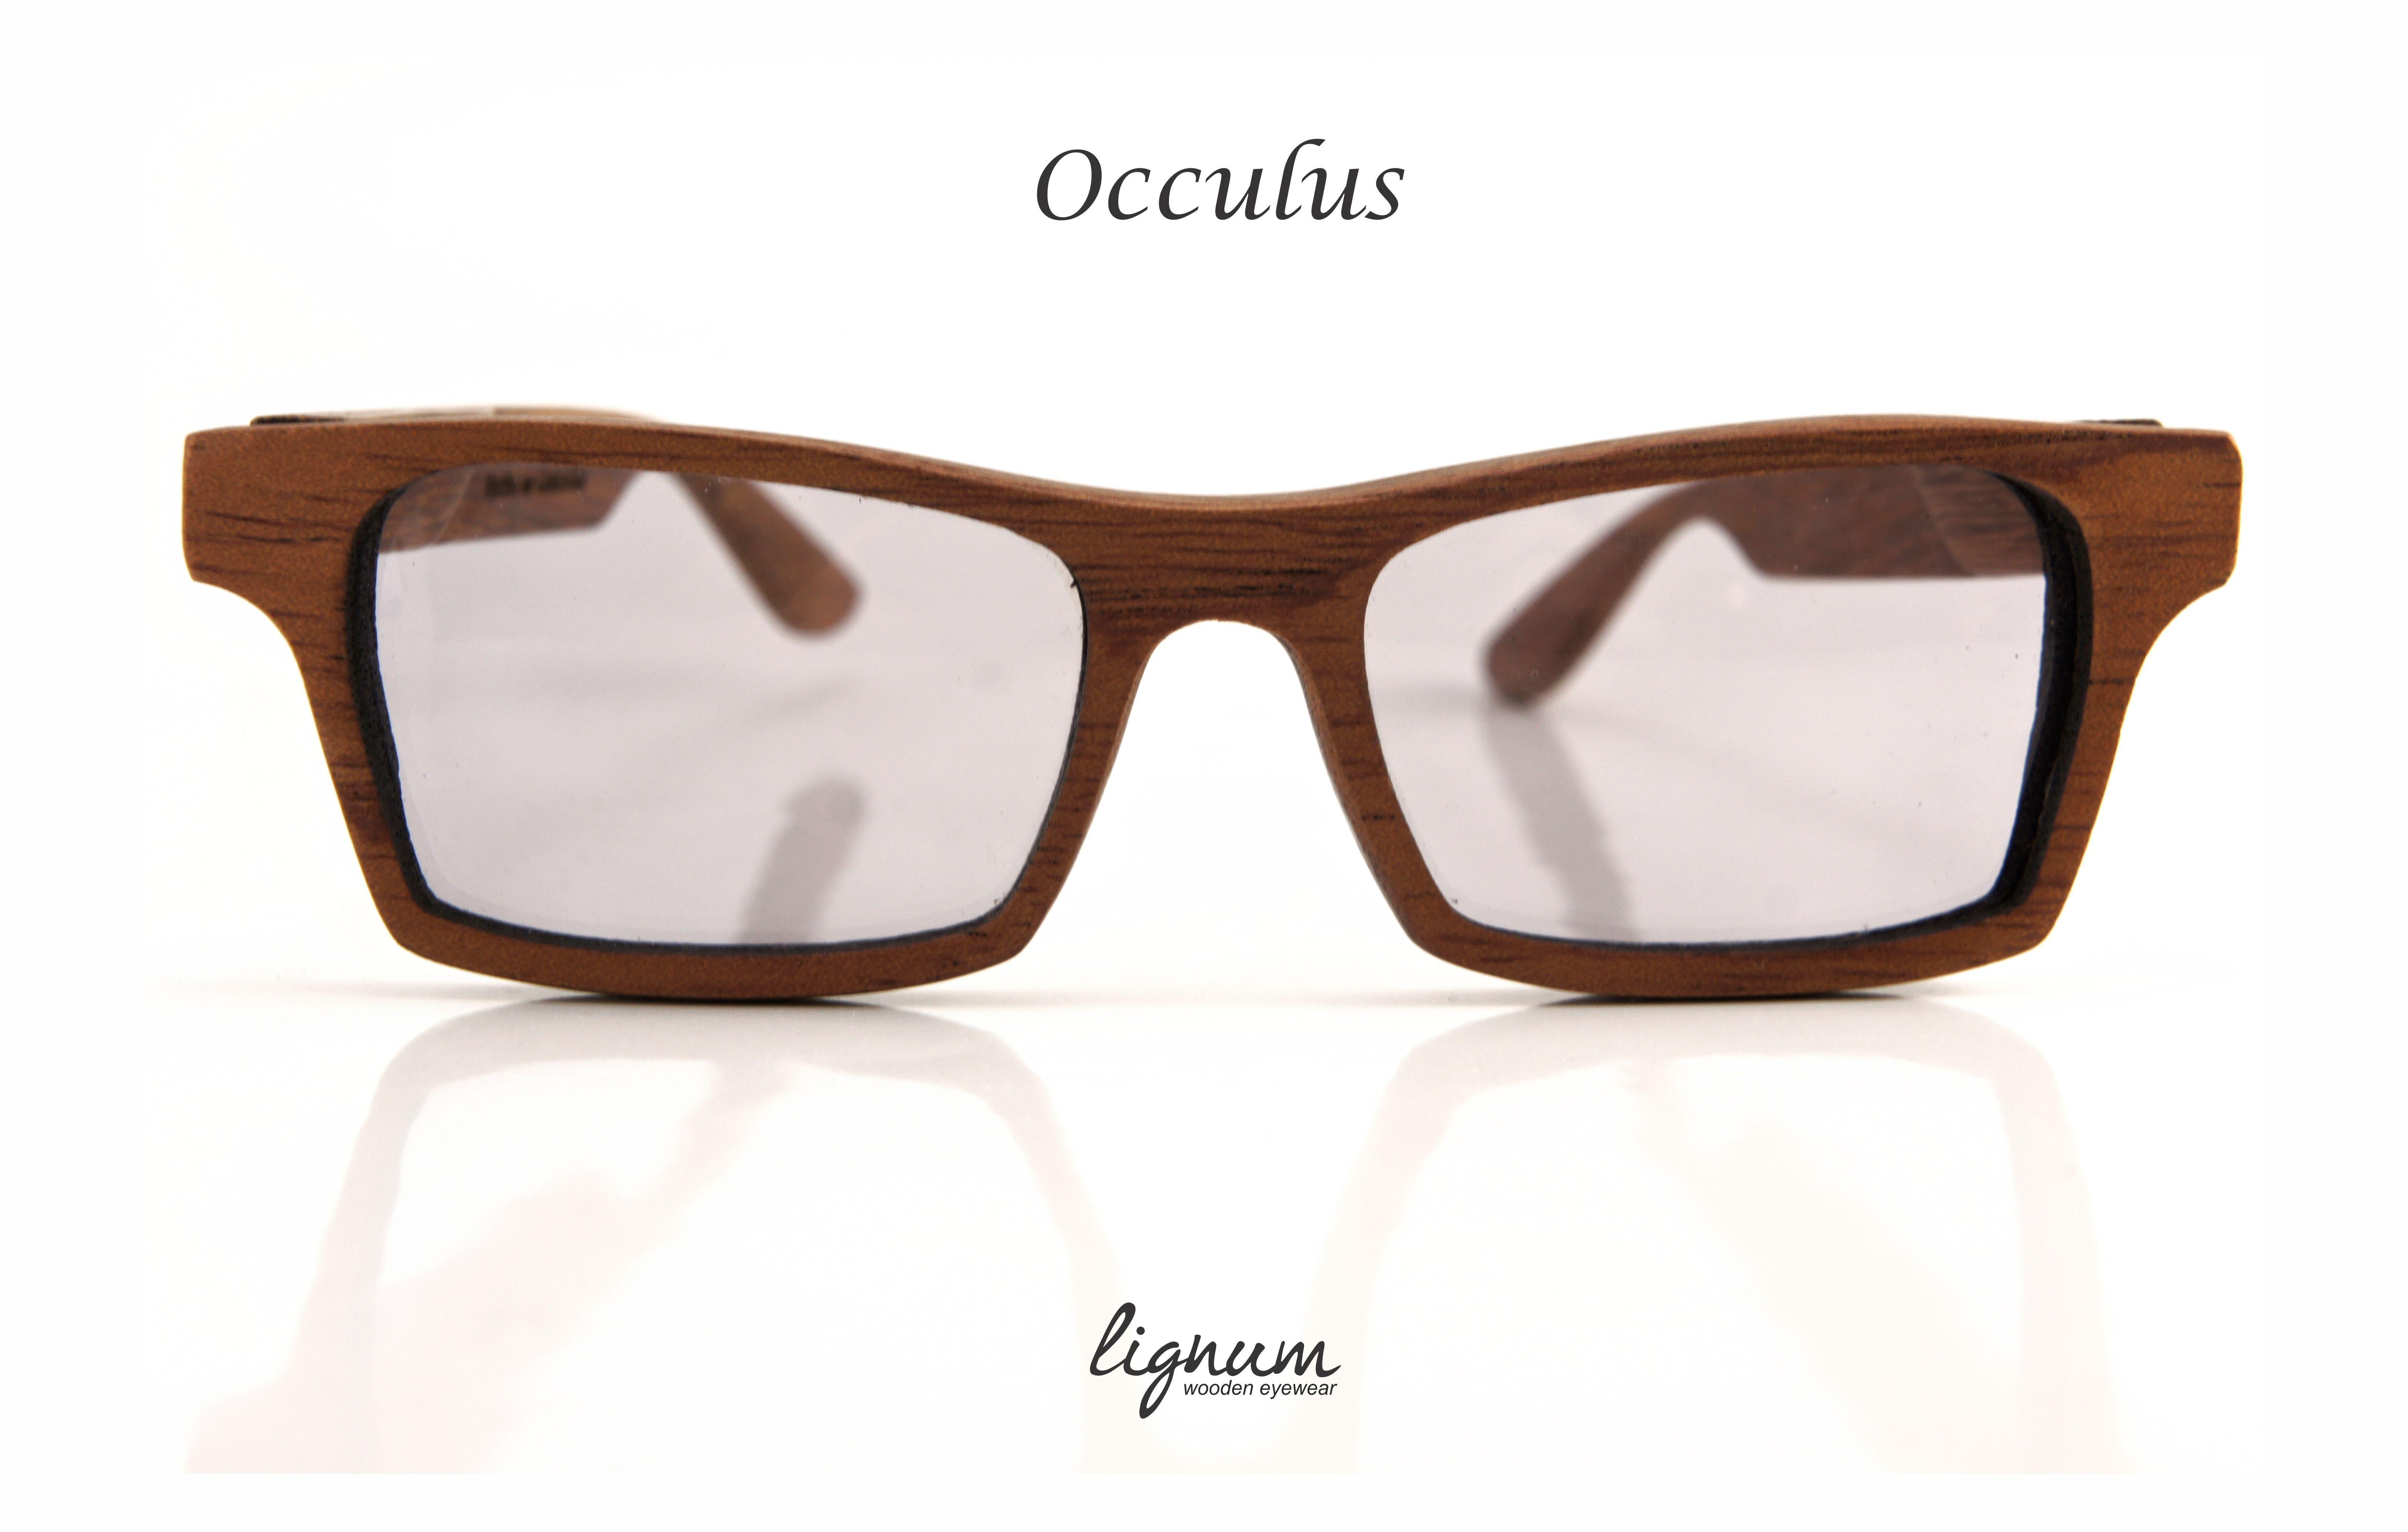 Occulus II Frames